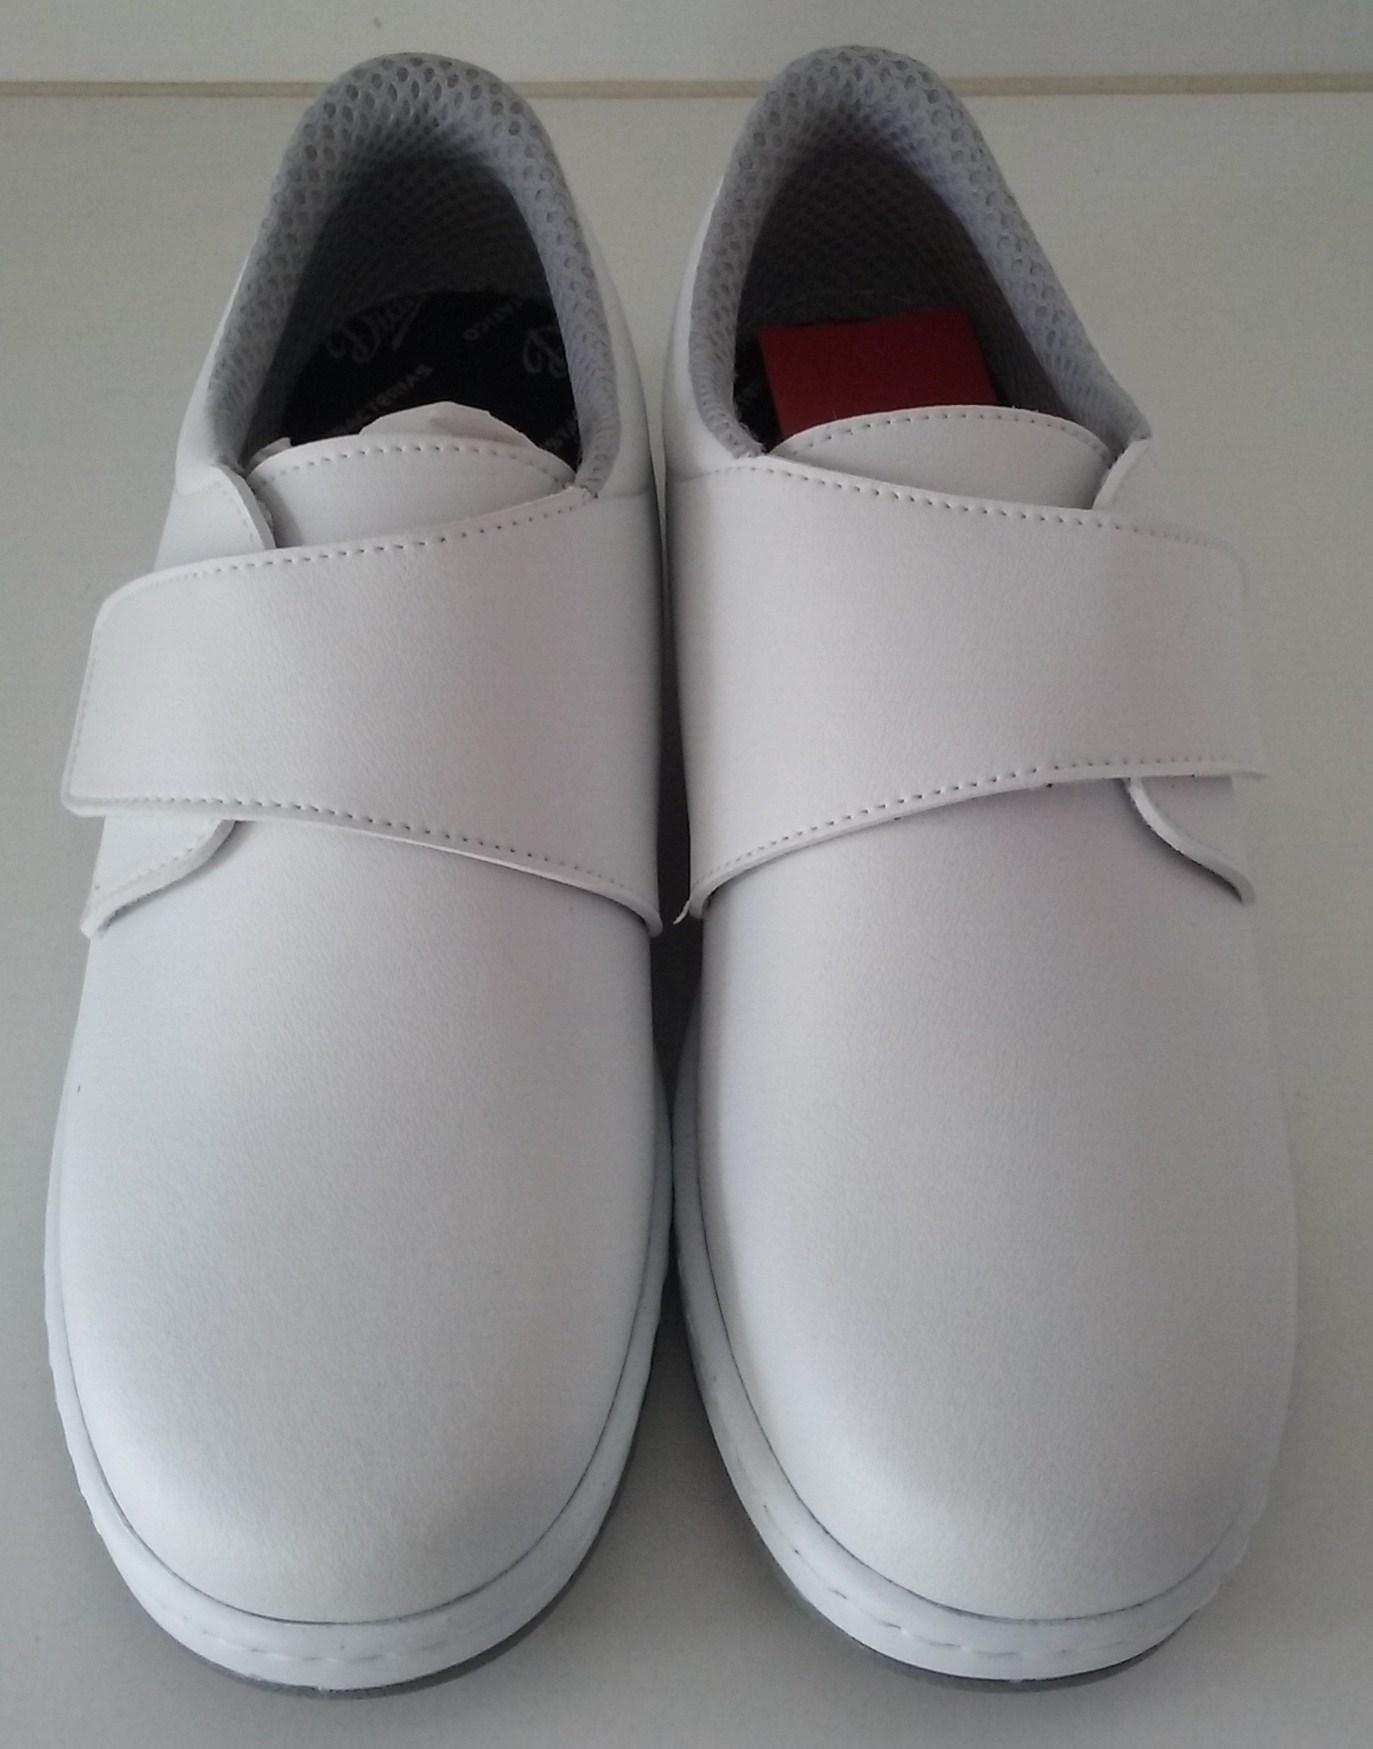 Zapato velcro blanco.